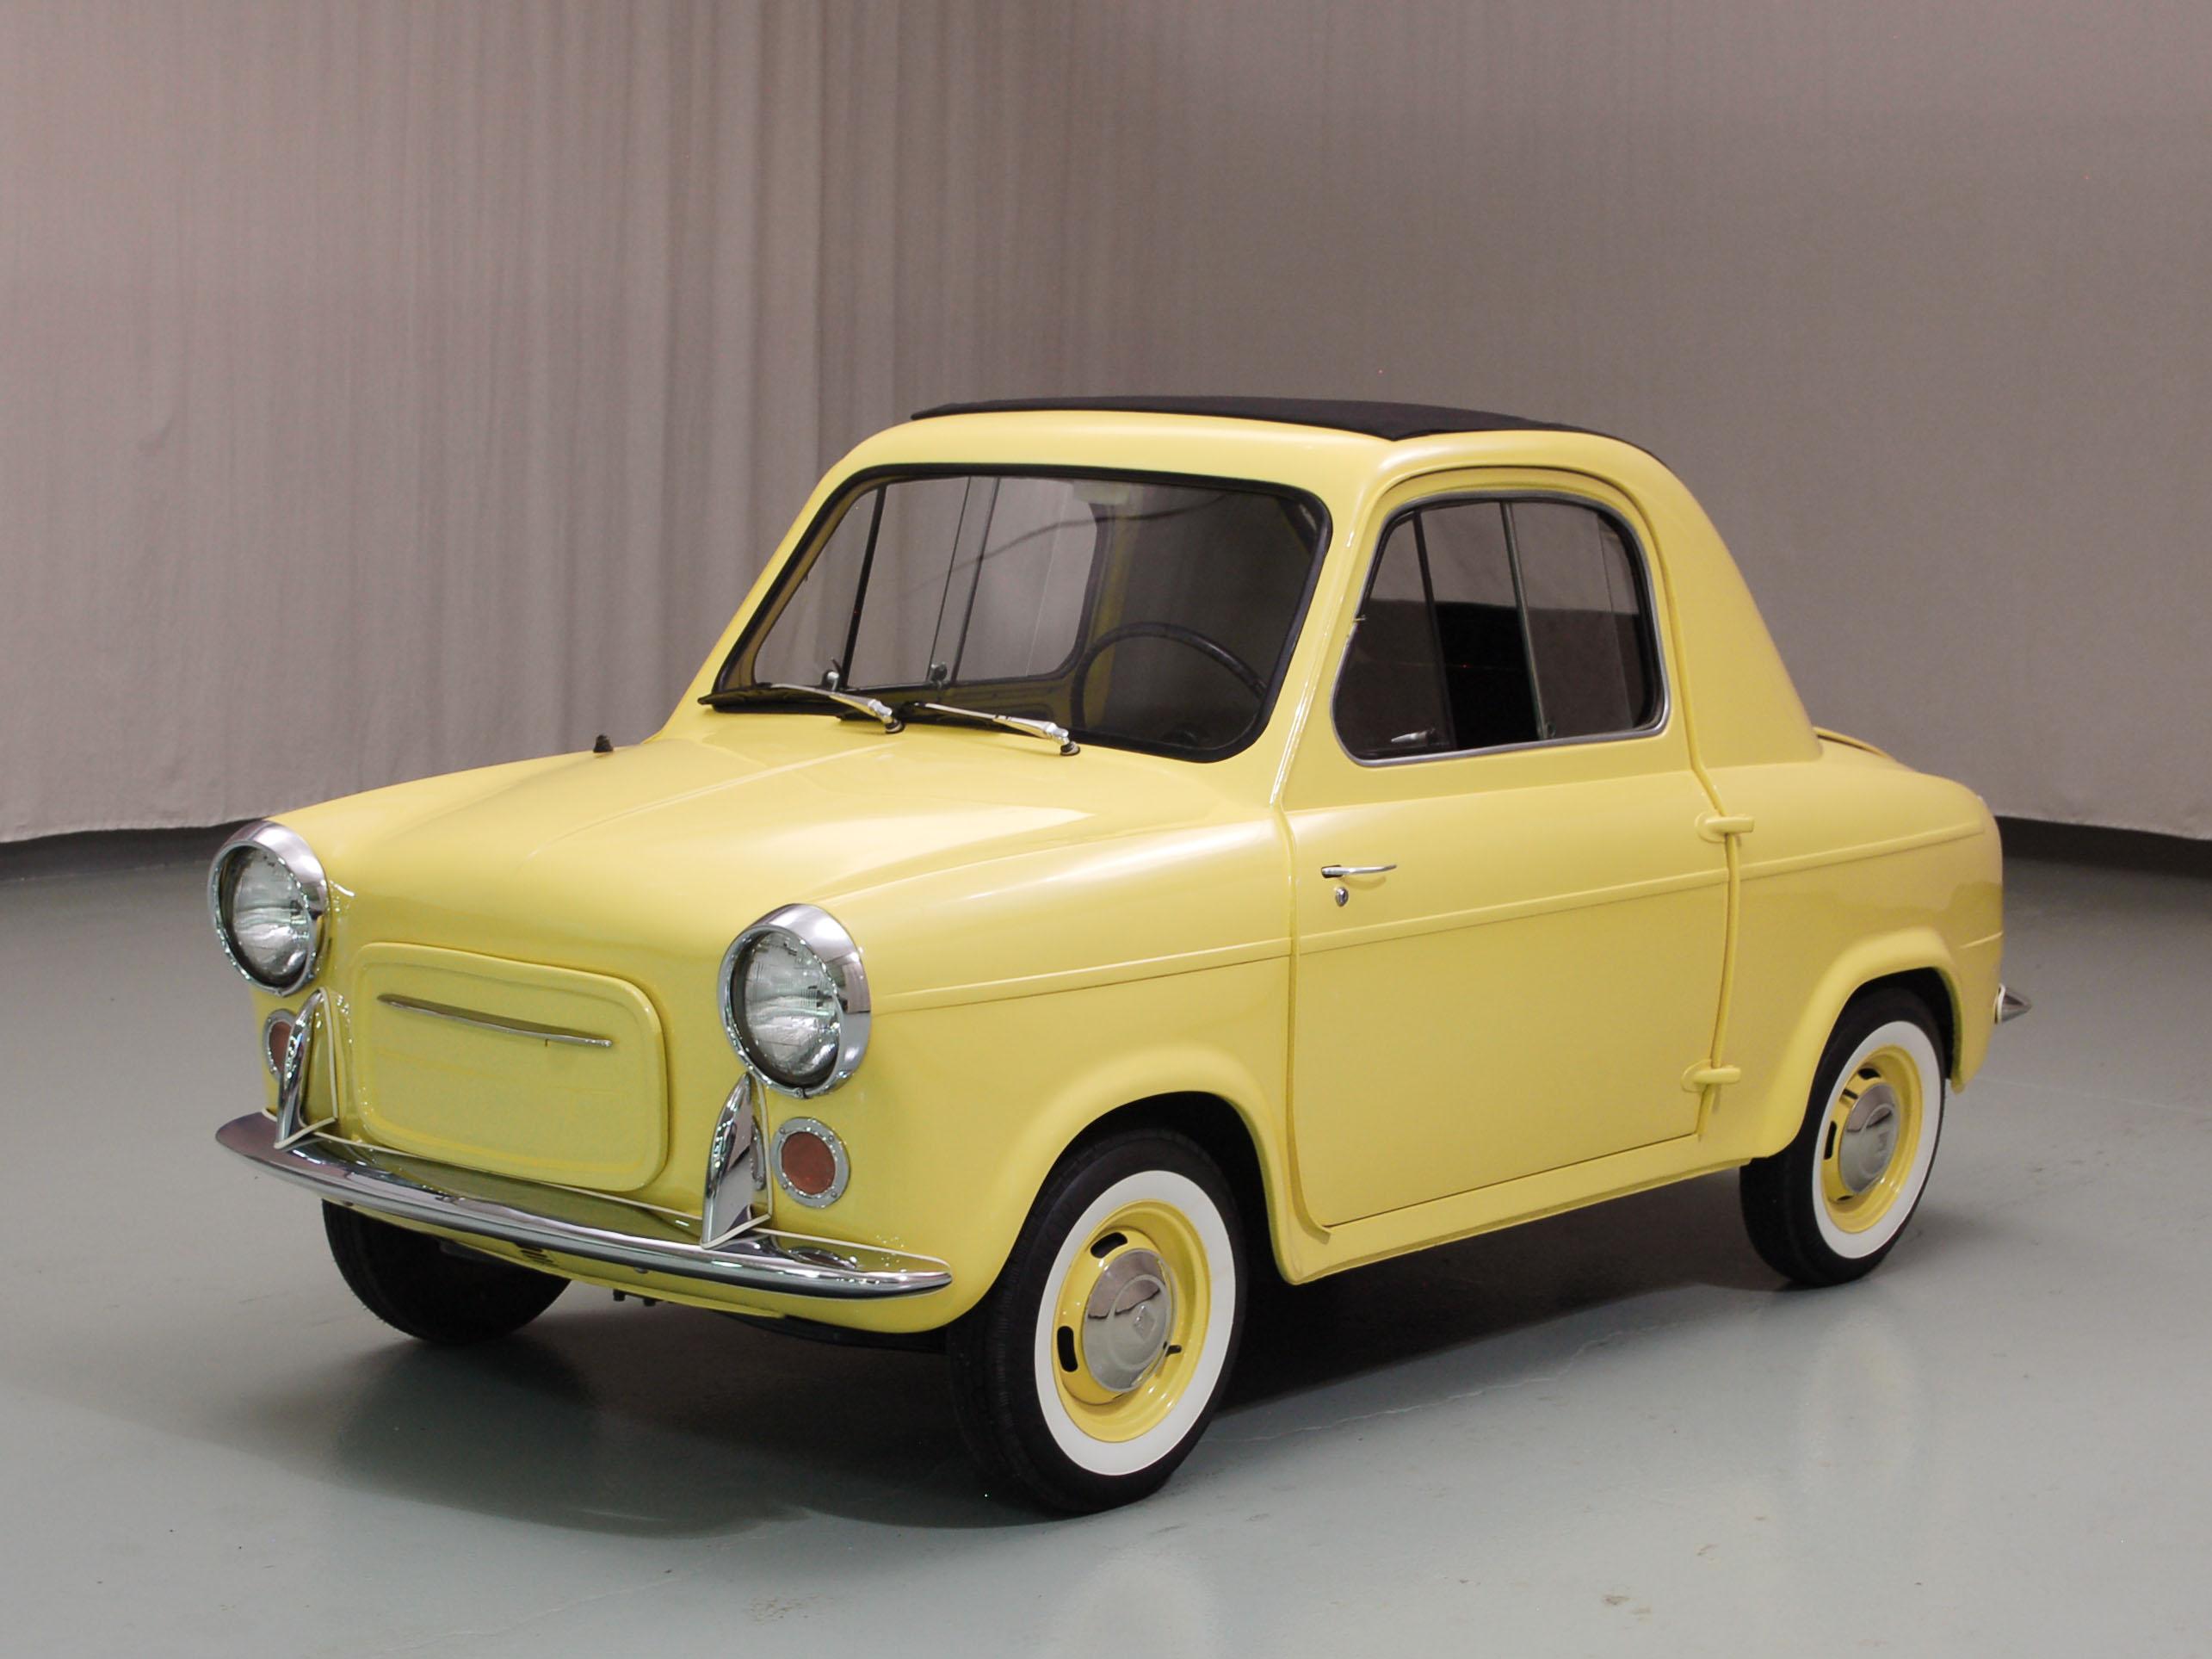 1960-vespa-400.jpg